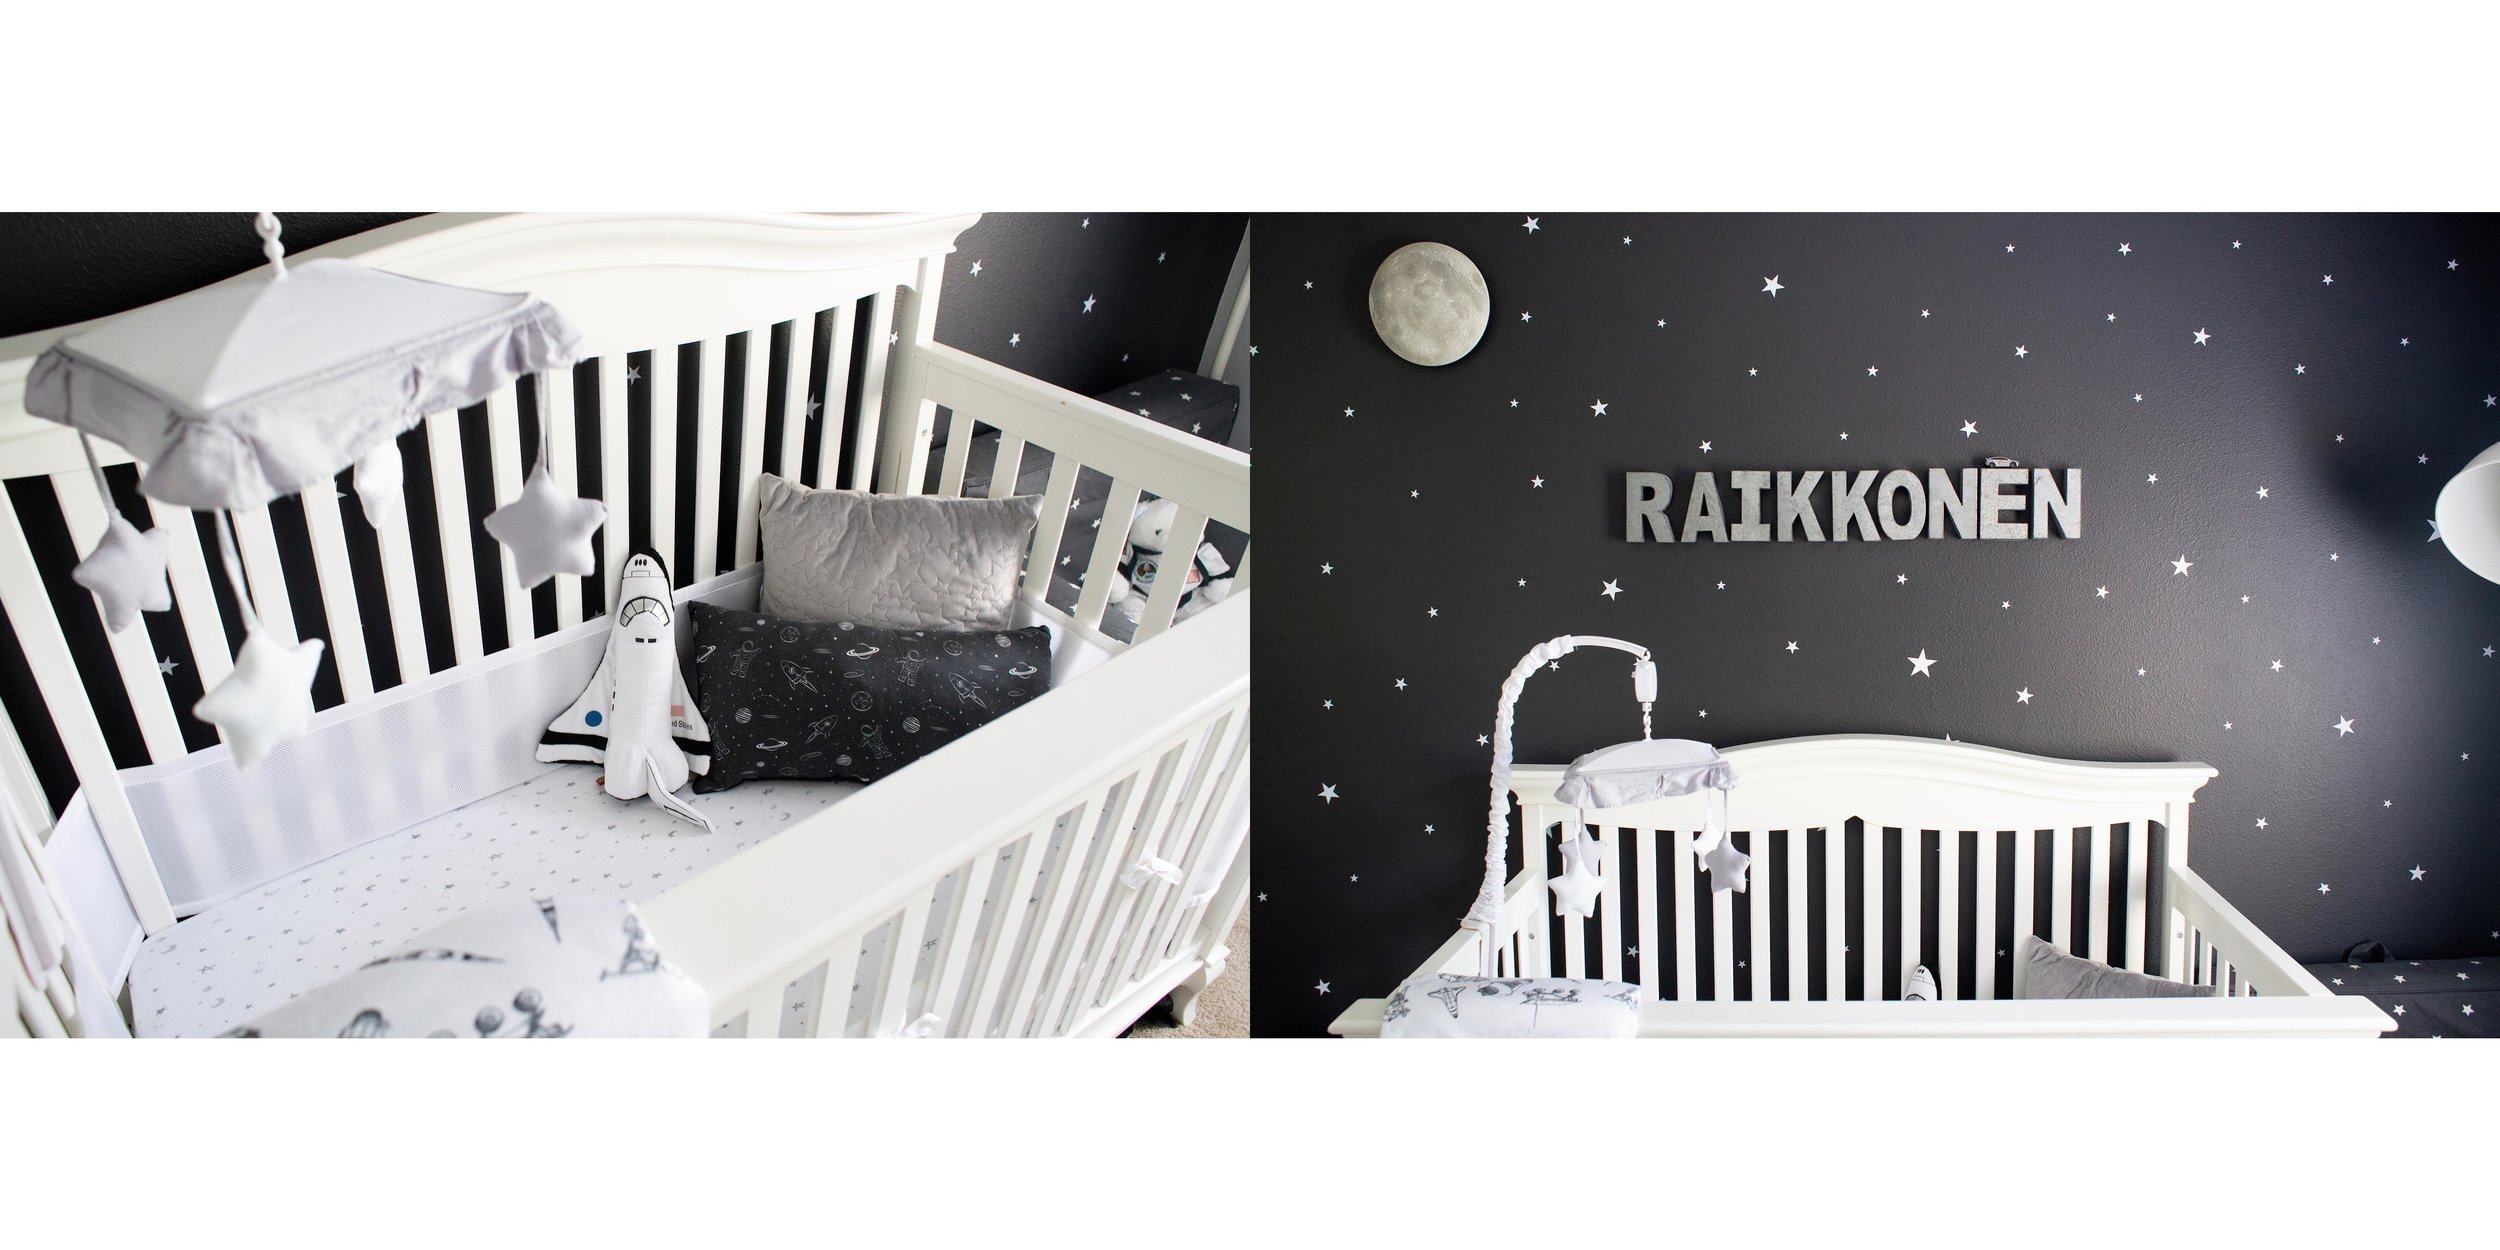 Raikkonen's_room_05.jpg